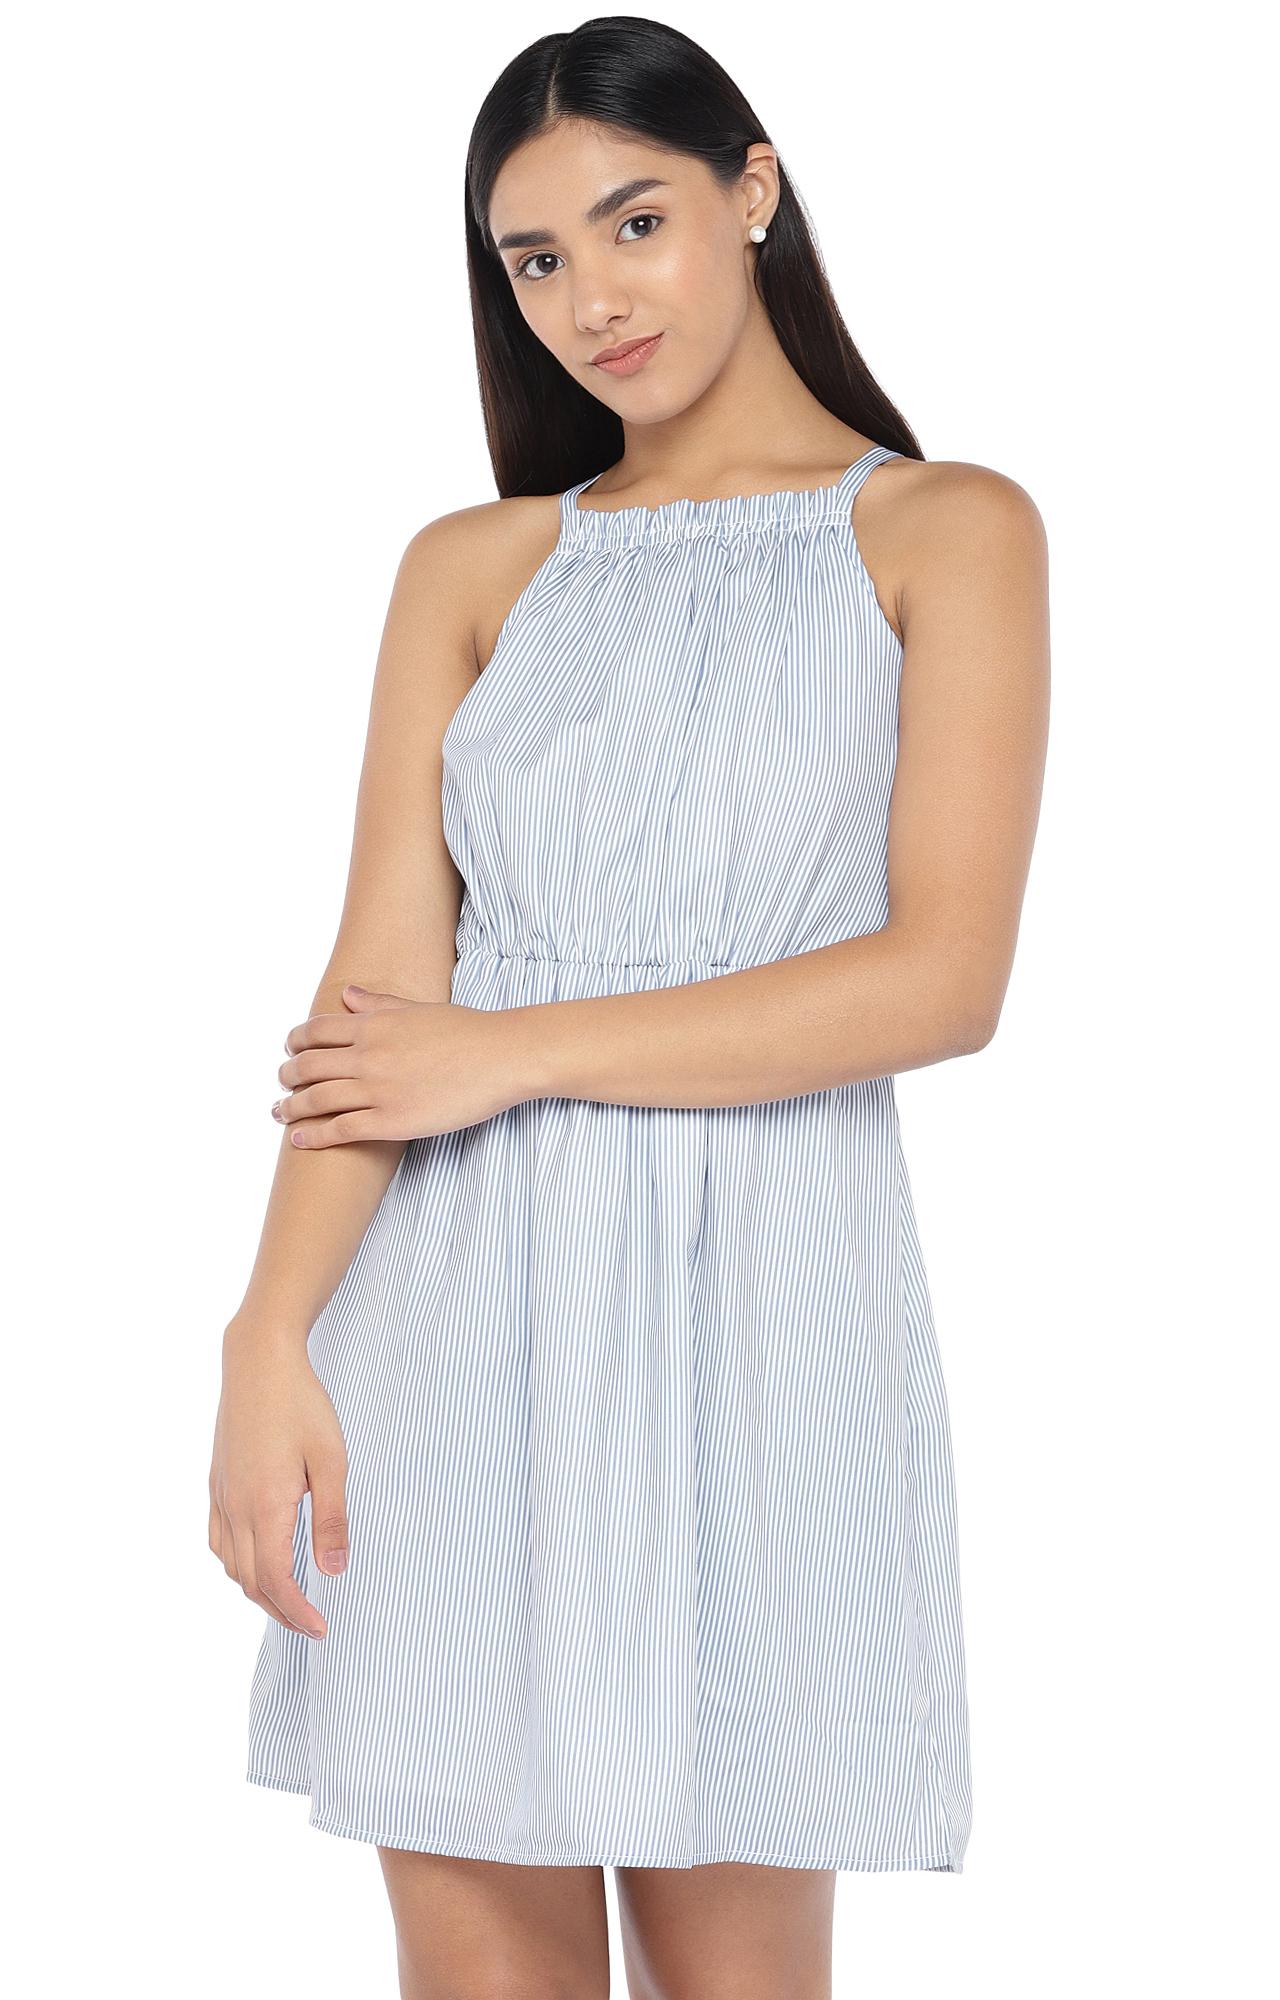 globus | Blue Striped Skater Dress